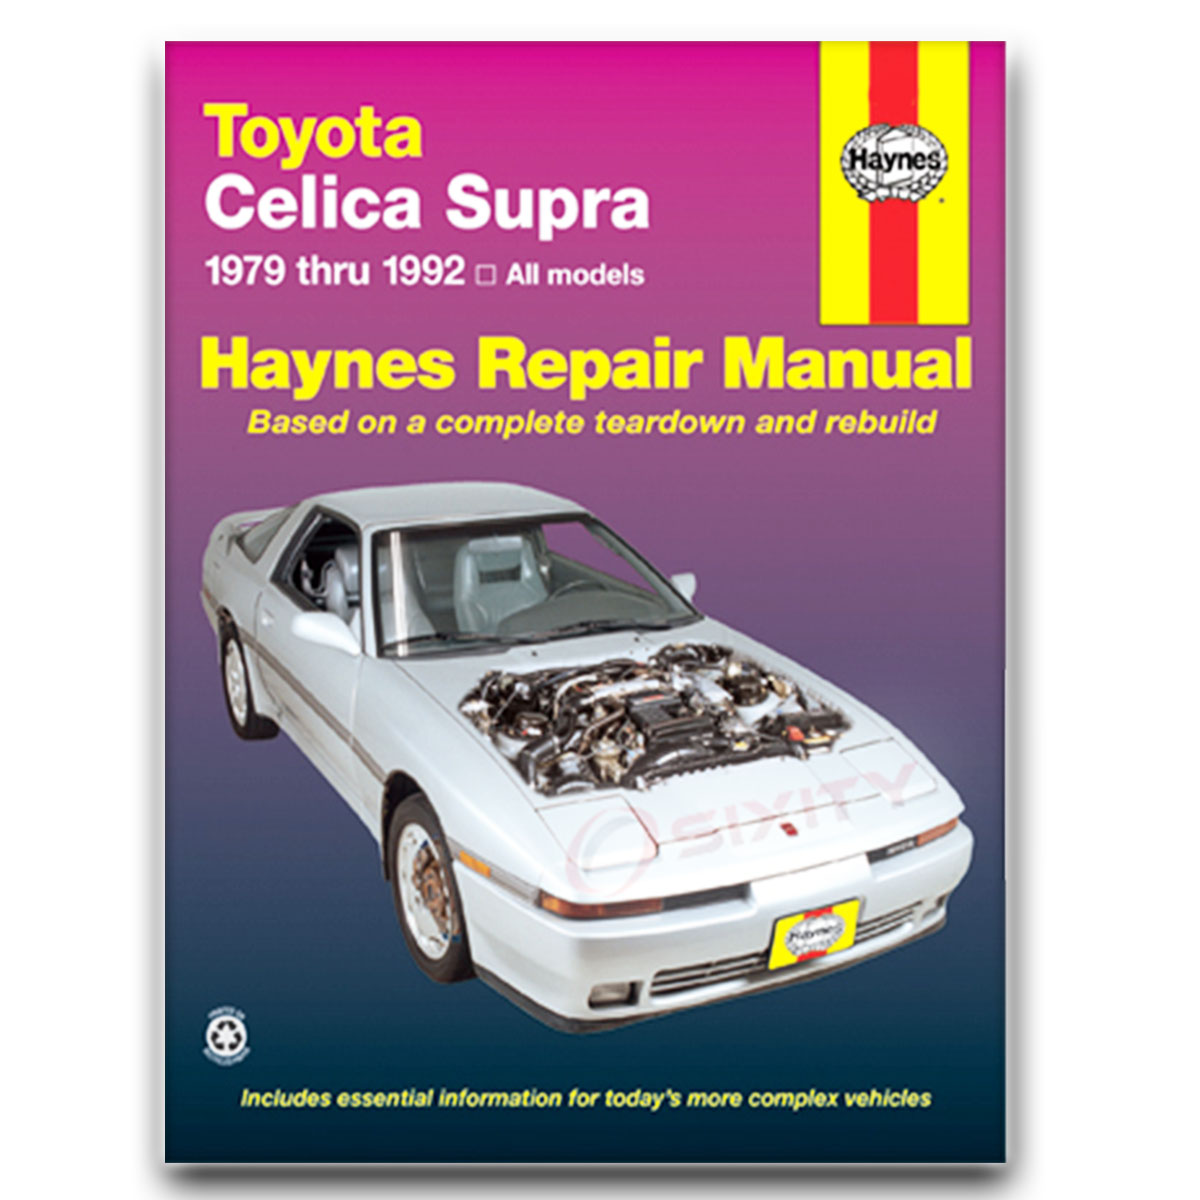 toyota supra haynes repair manual turbo base shop service garage rh ebay com toyota supra repair manual download mk4 supra repair manual